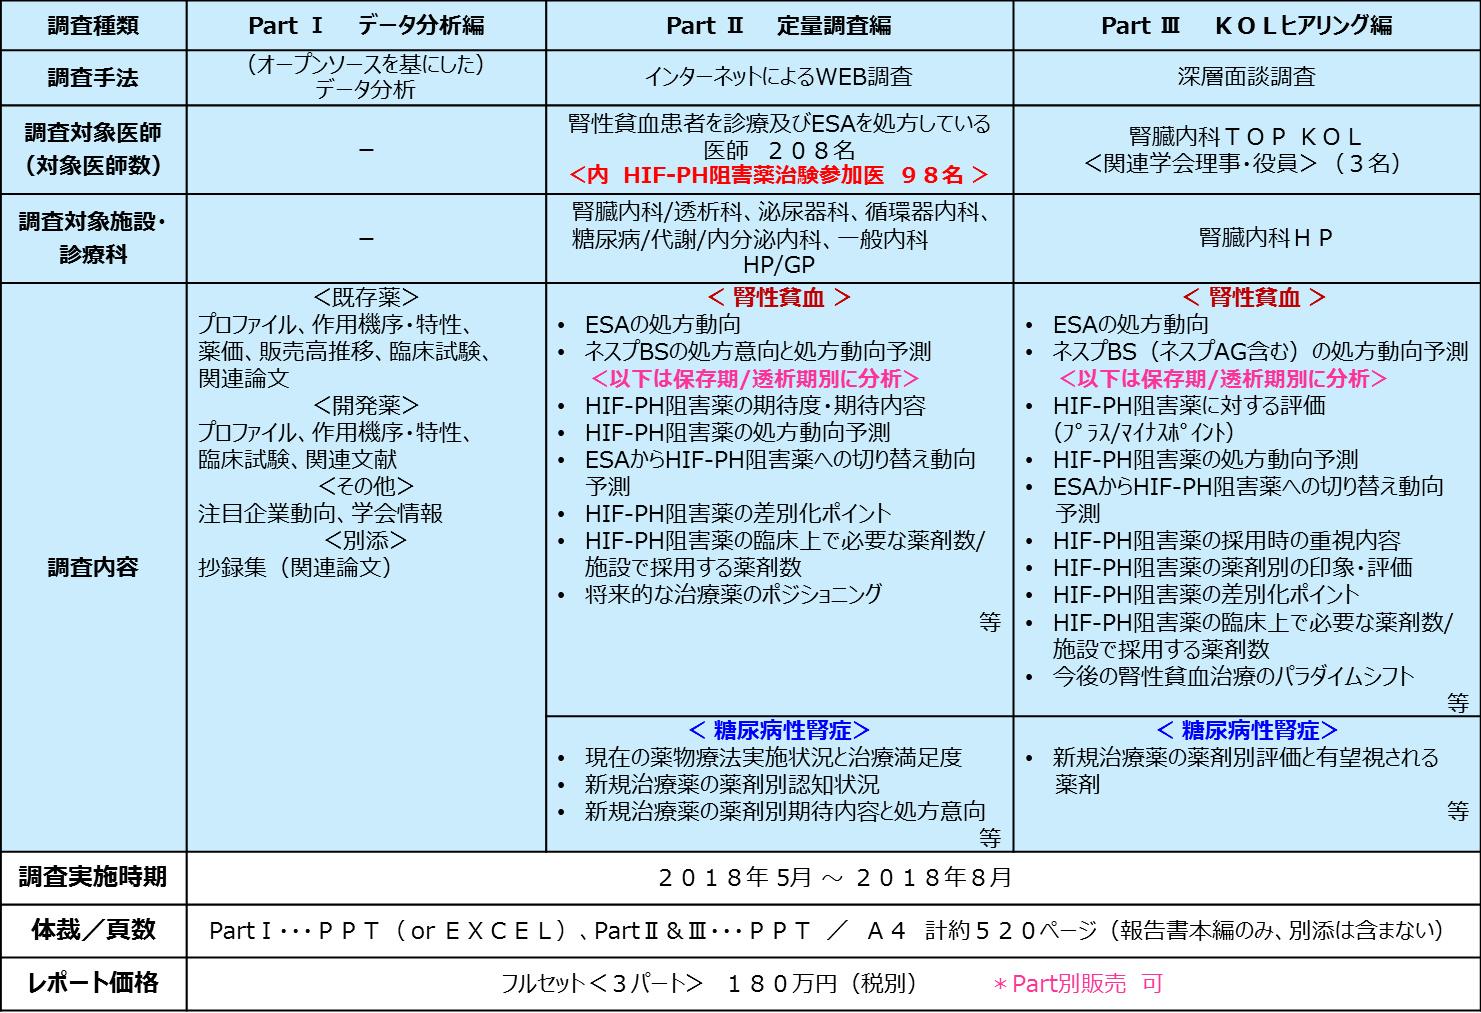 Ph 阻害 薬 Hif